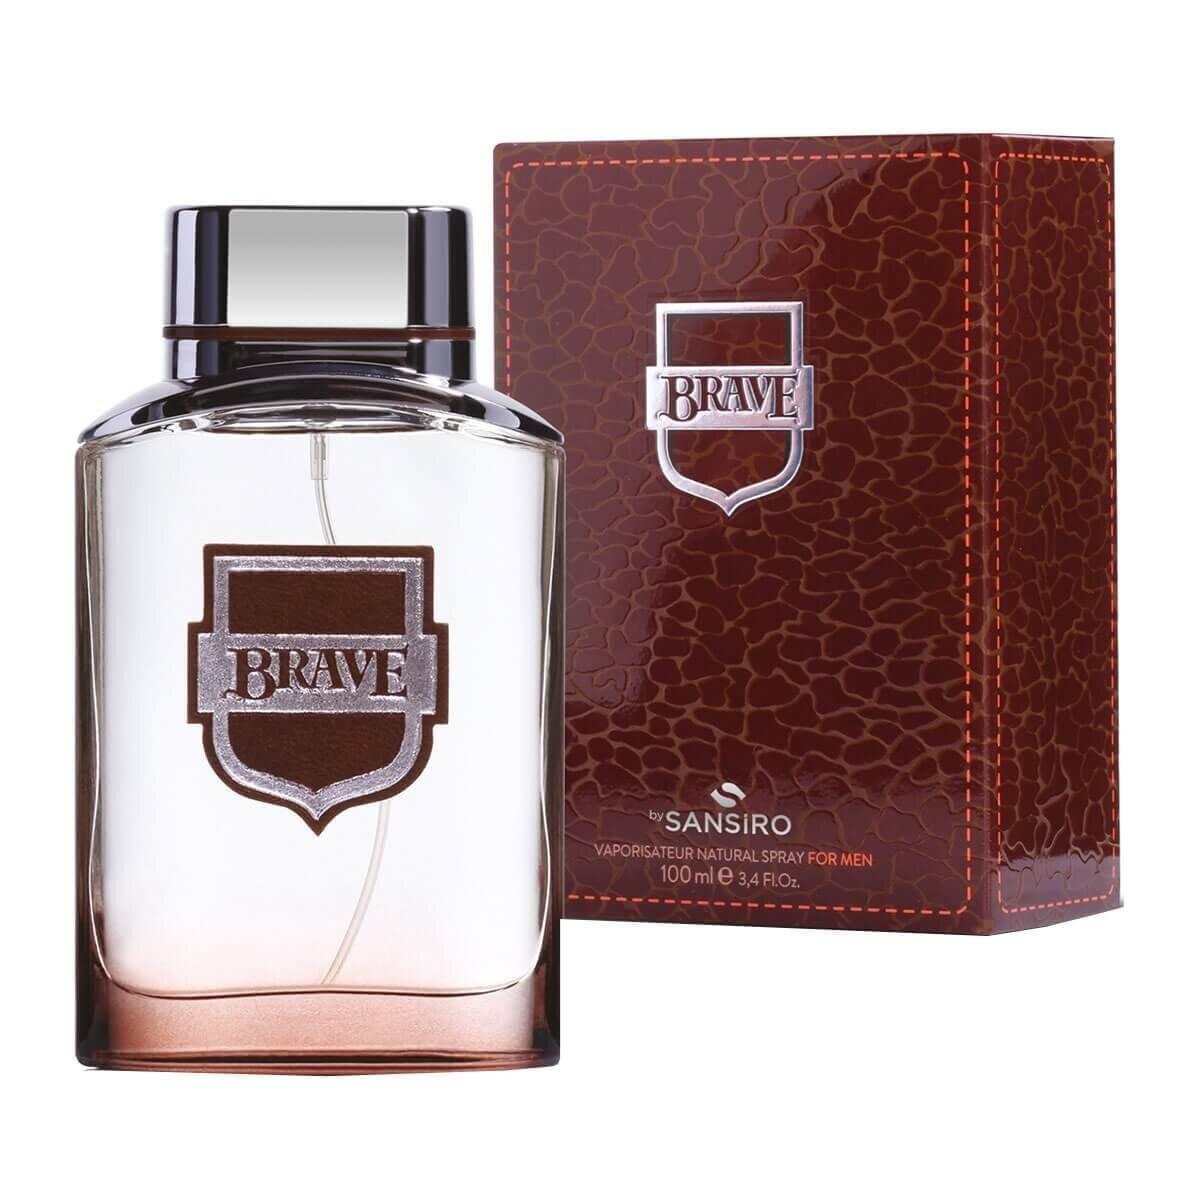 Brave Erkek Parfümü Edt 100 ml